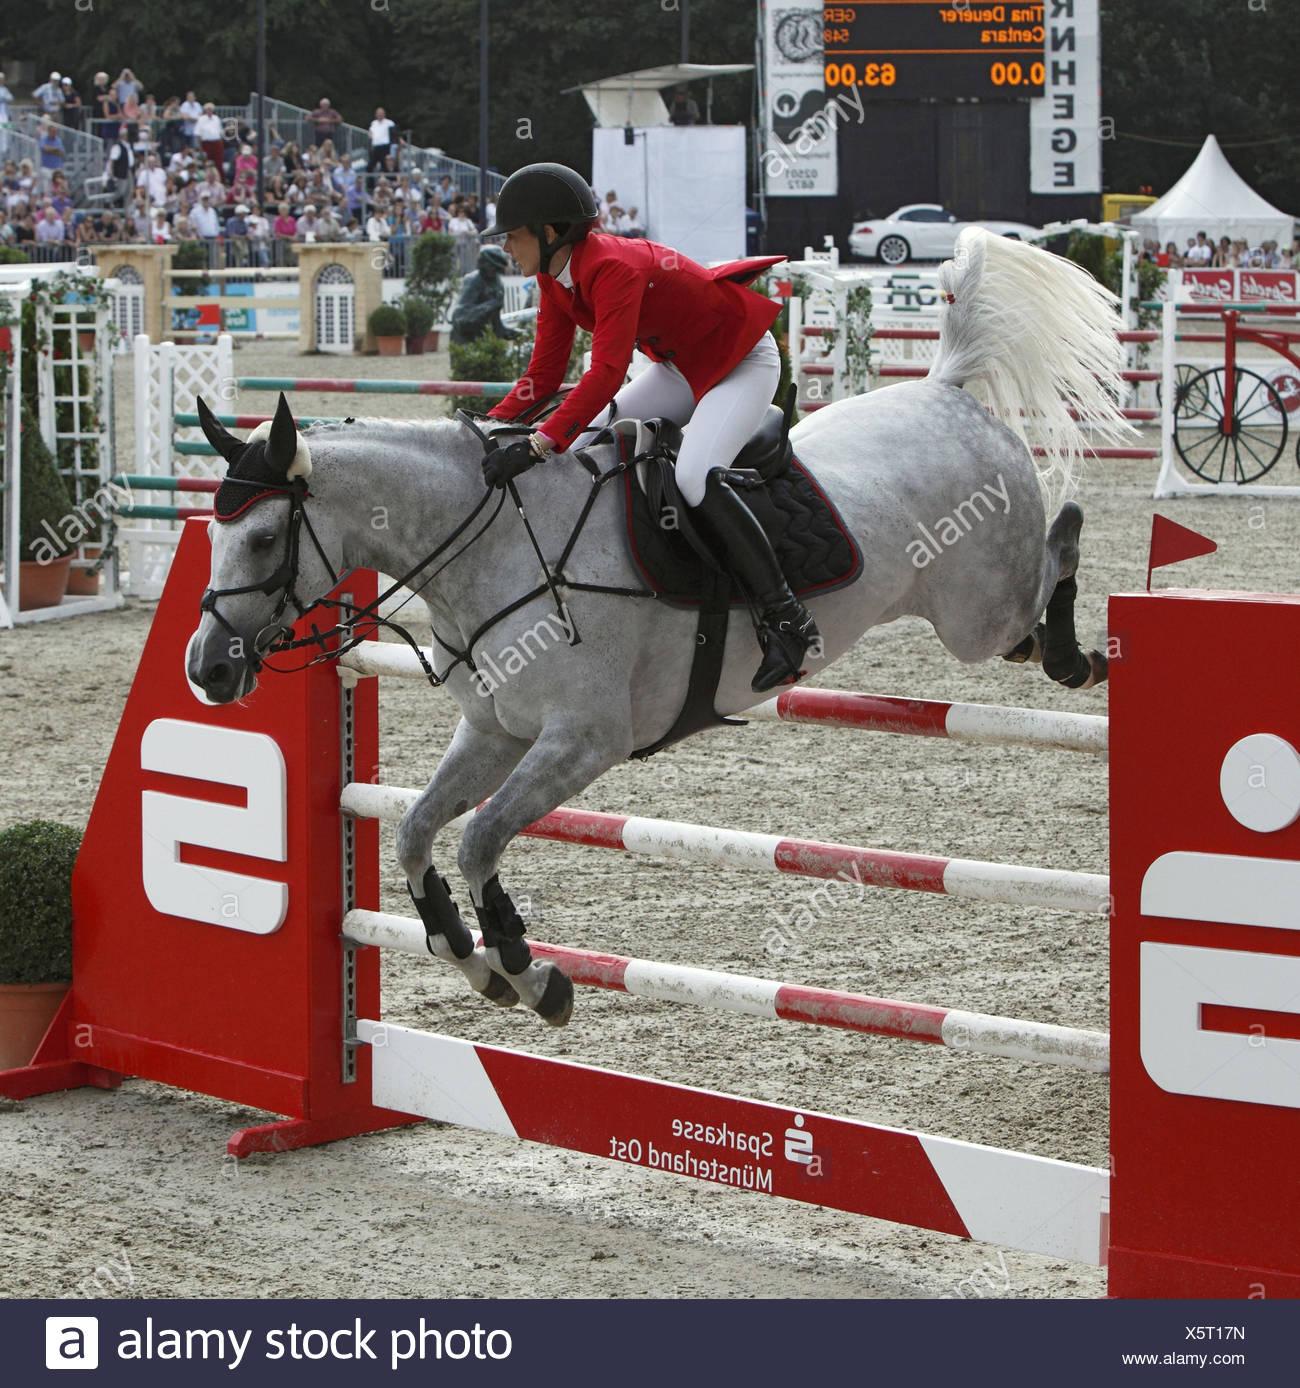 Horse-racing, German championships jumping and training in 2010 in Münster, Springreiterinnen, Tina Deuerer on Centara, - Stock Image